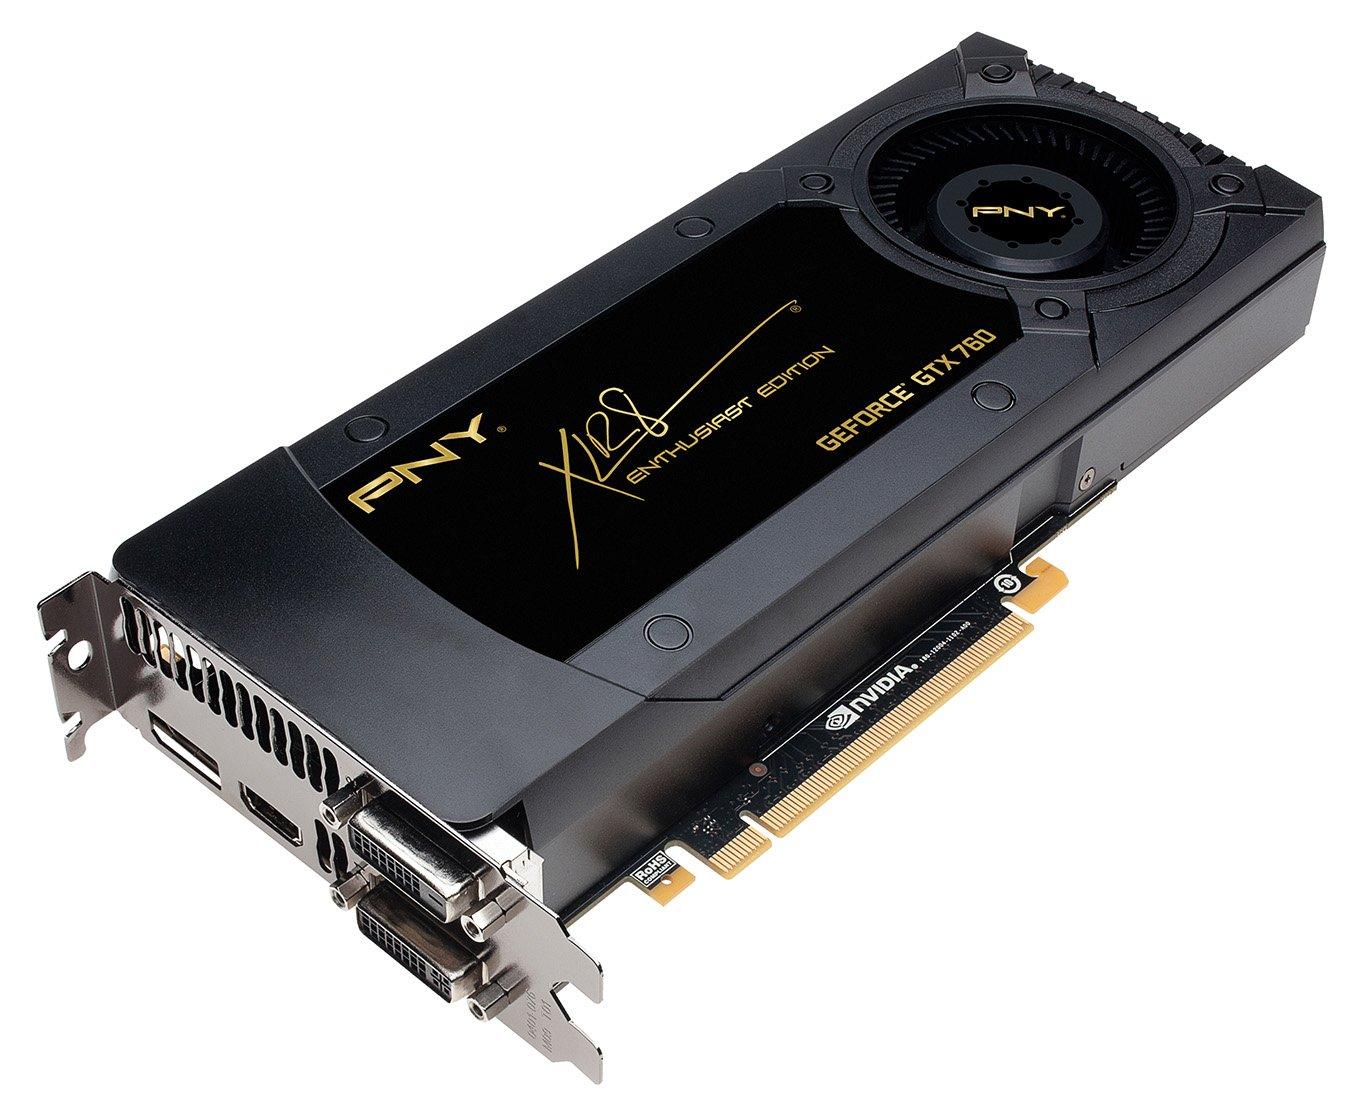 PNY GeForce GTX 760 - Tarjeta gráfica de 2 GB (GeForce GTX 760, 4096x2160, GDDR5, HDMI)